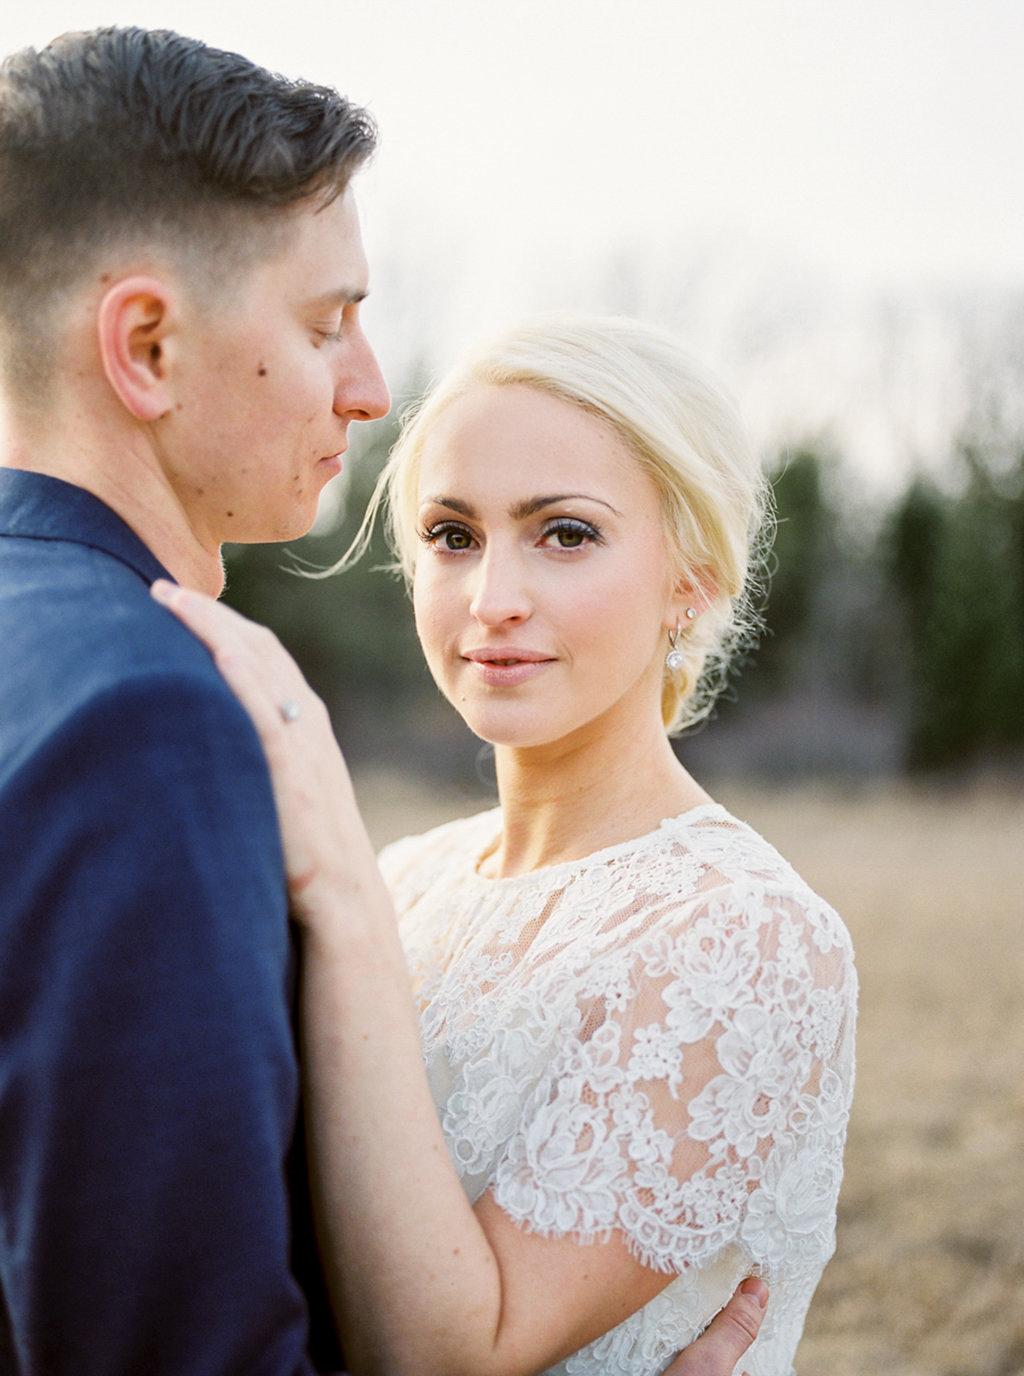 kayla-yestal-photography-vineyard-bride-swish-list-beamer-falls-manor-grimsby-engagement-6.jpg